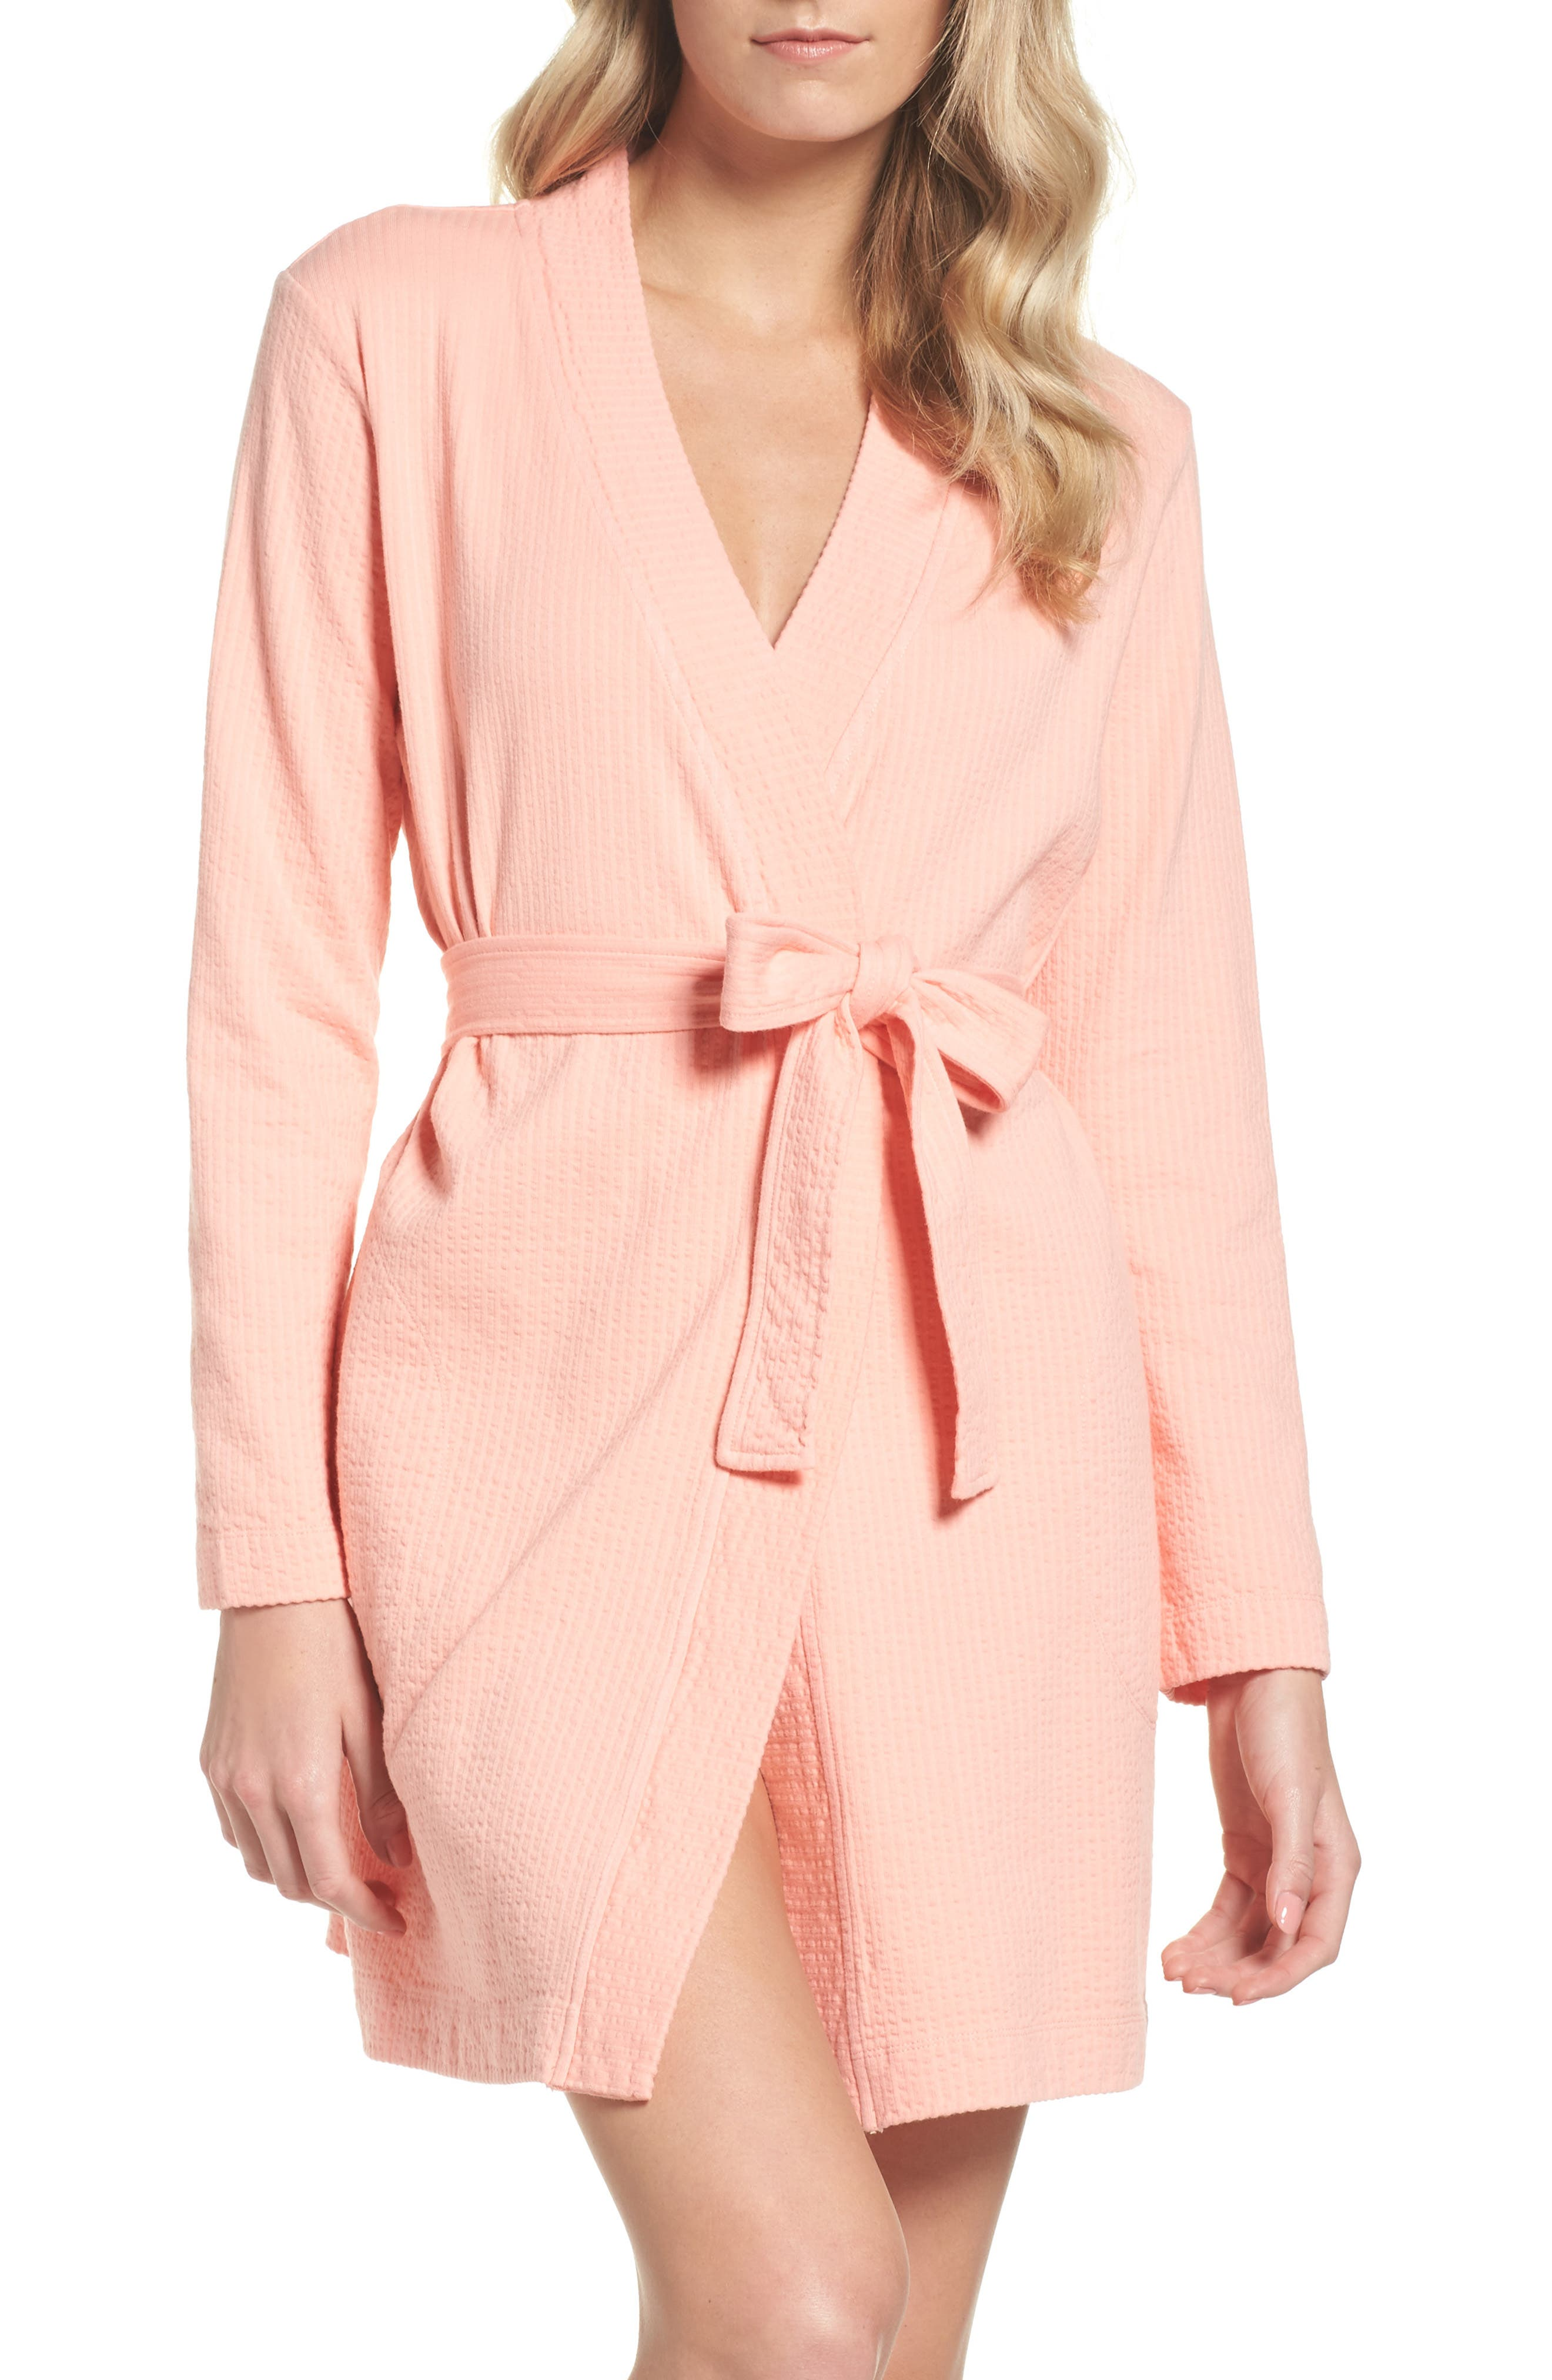 Jillie Short Robe,                         Main,                         color, VIBRANT CORAL